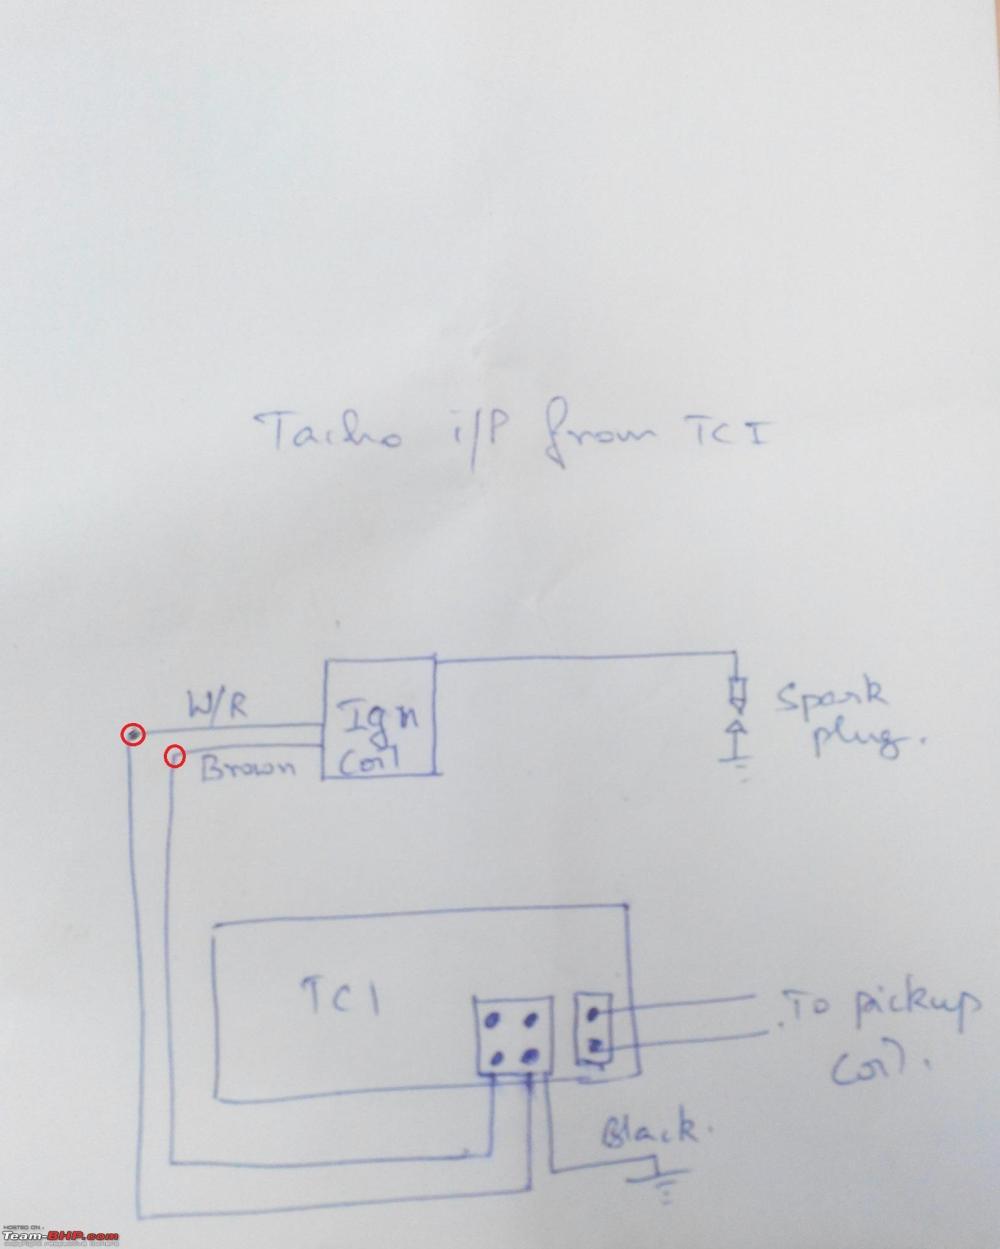 medium resolution of royal enfield 350 electra restoration upgrades ign circuit jpg